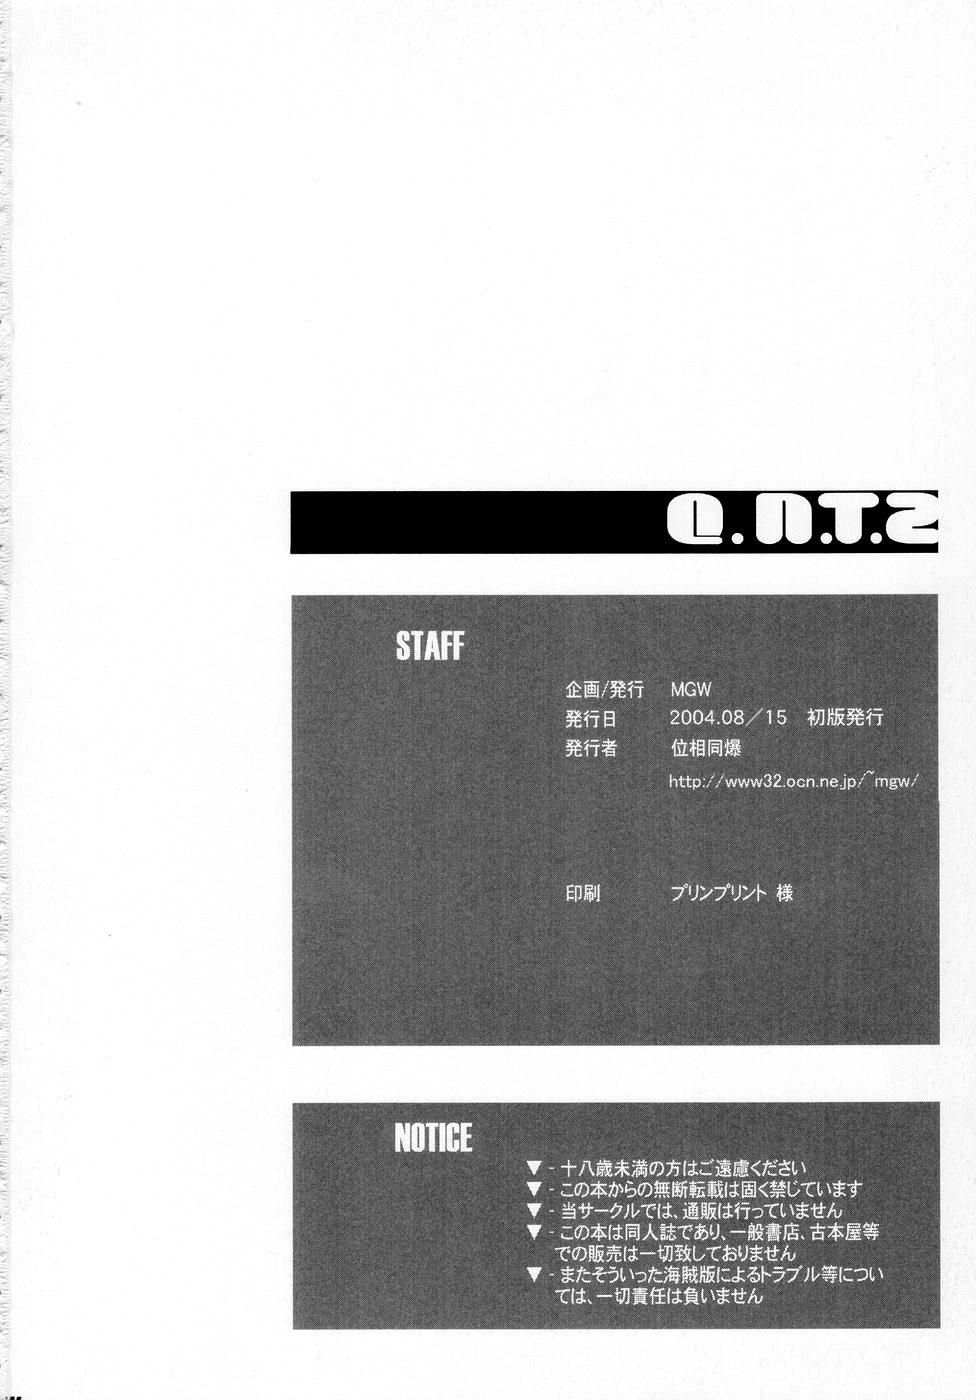 Q.N.T.2 - Queen Ninja Tsunade 2 32